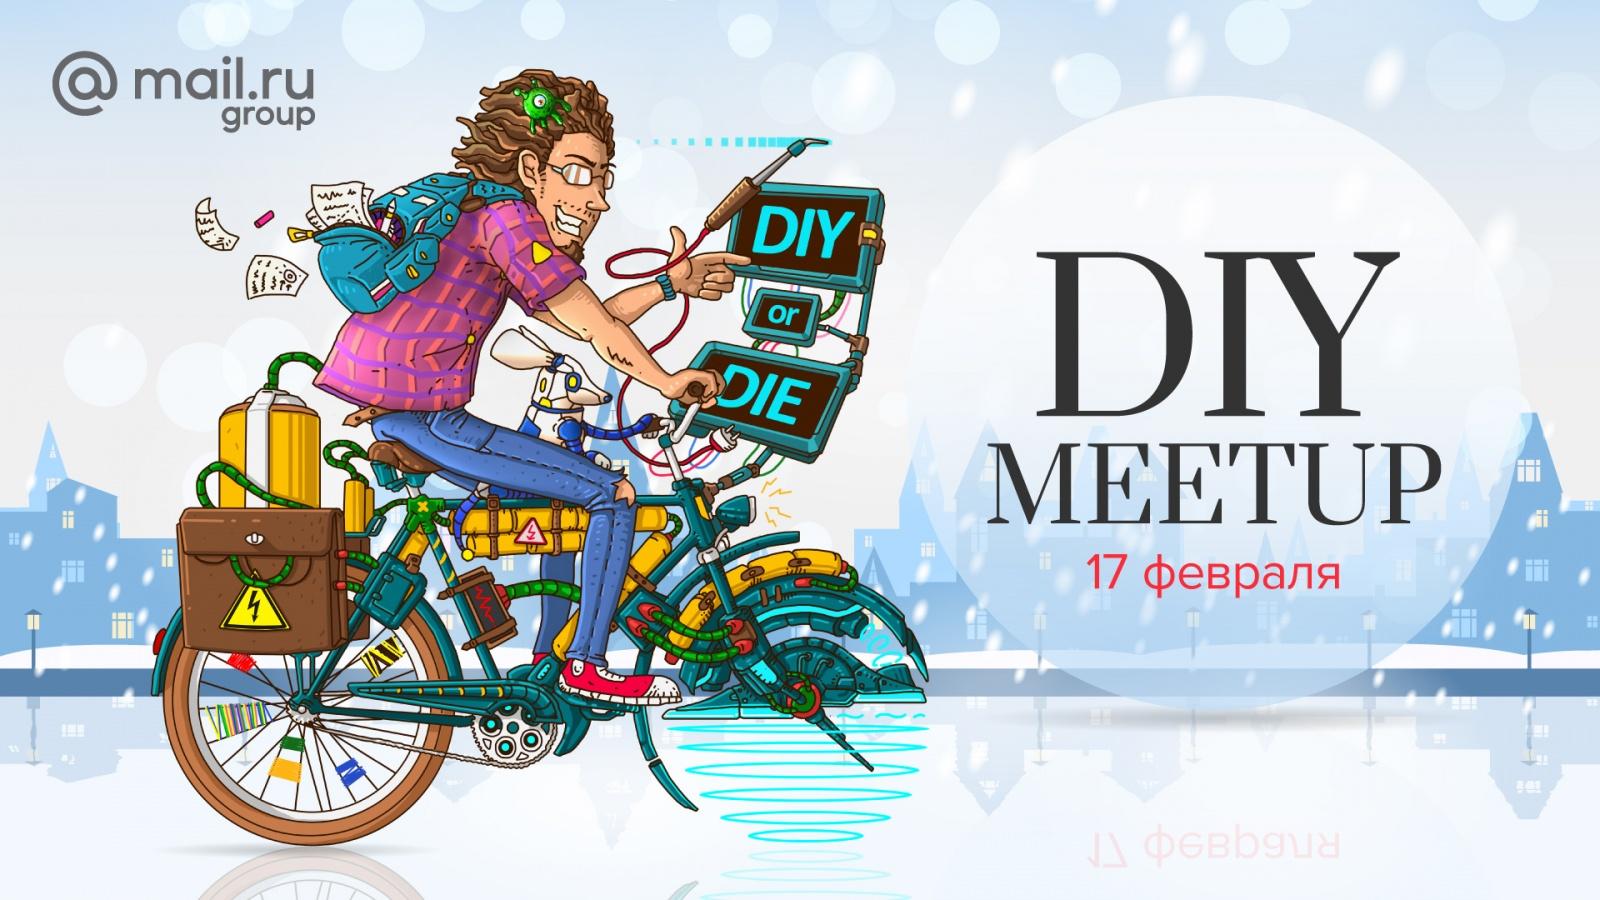 Зимний DIYorDIE Meetup 17 февраля - 1